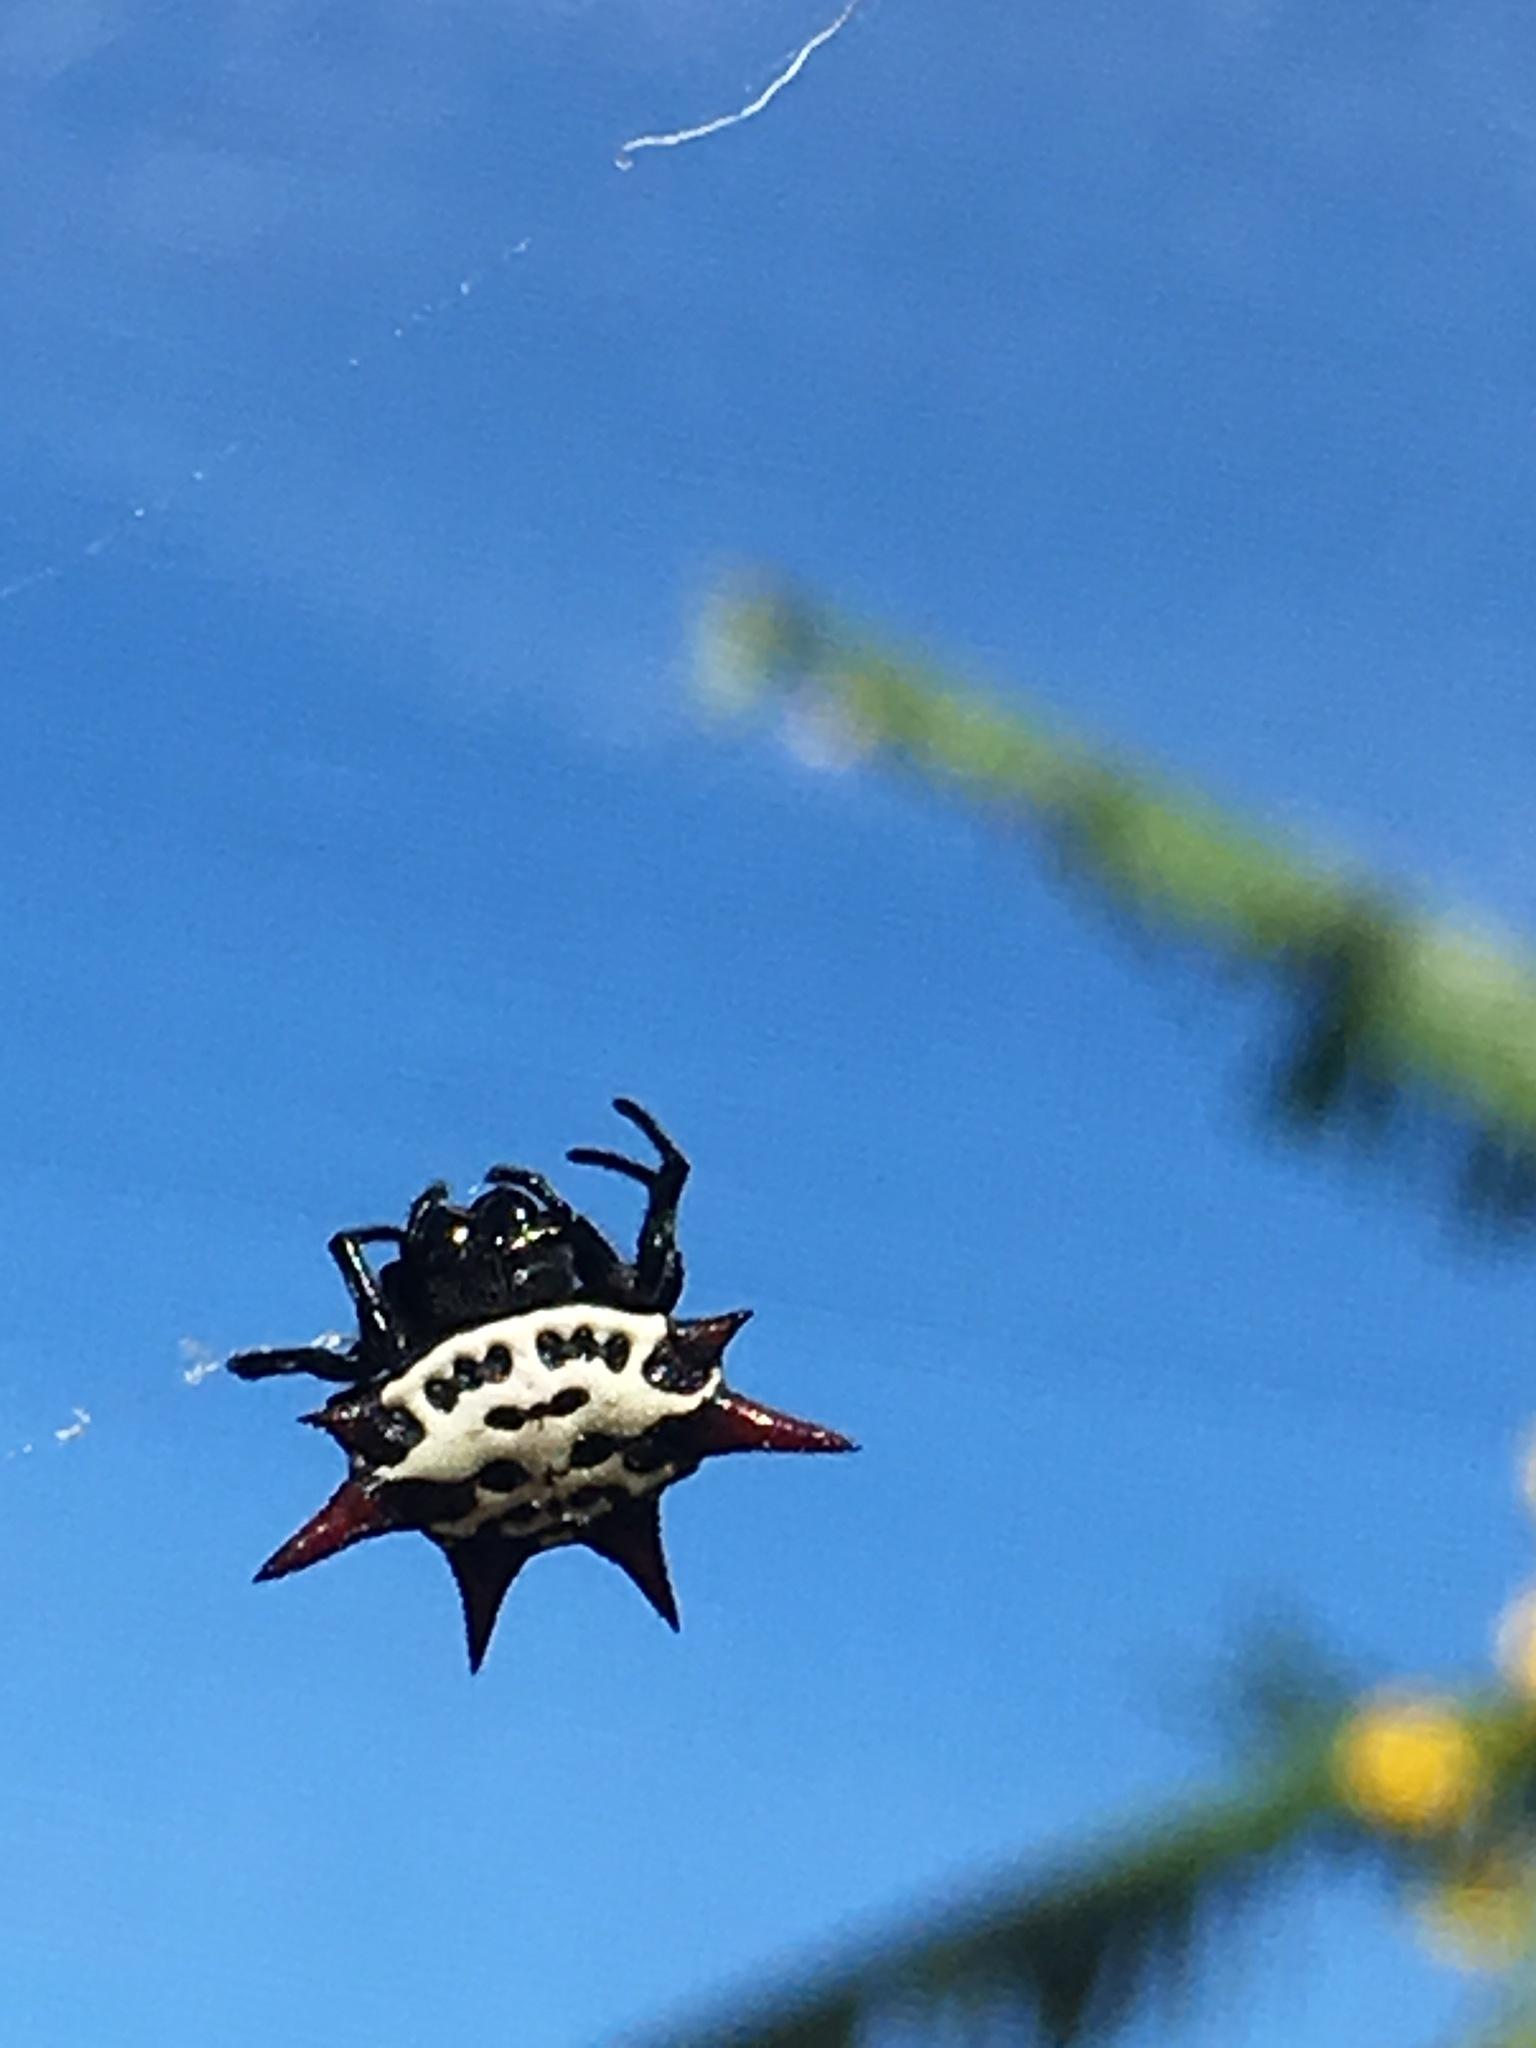 Spiny orb weaver spider by pamela.kanarr